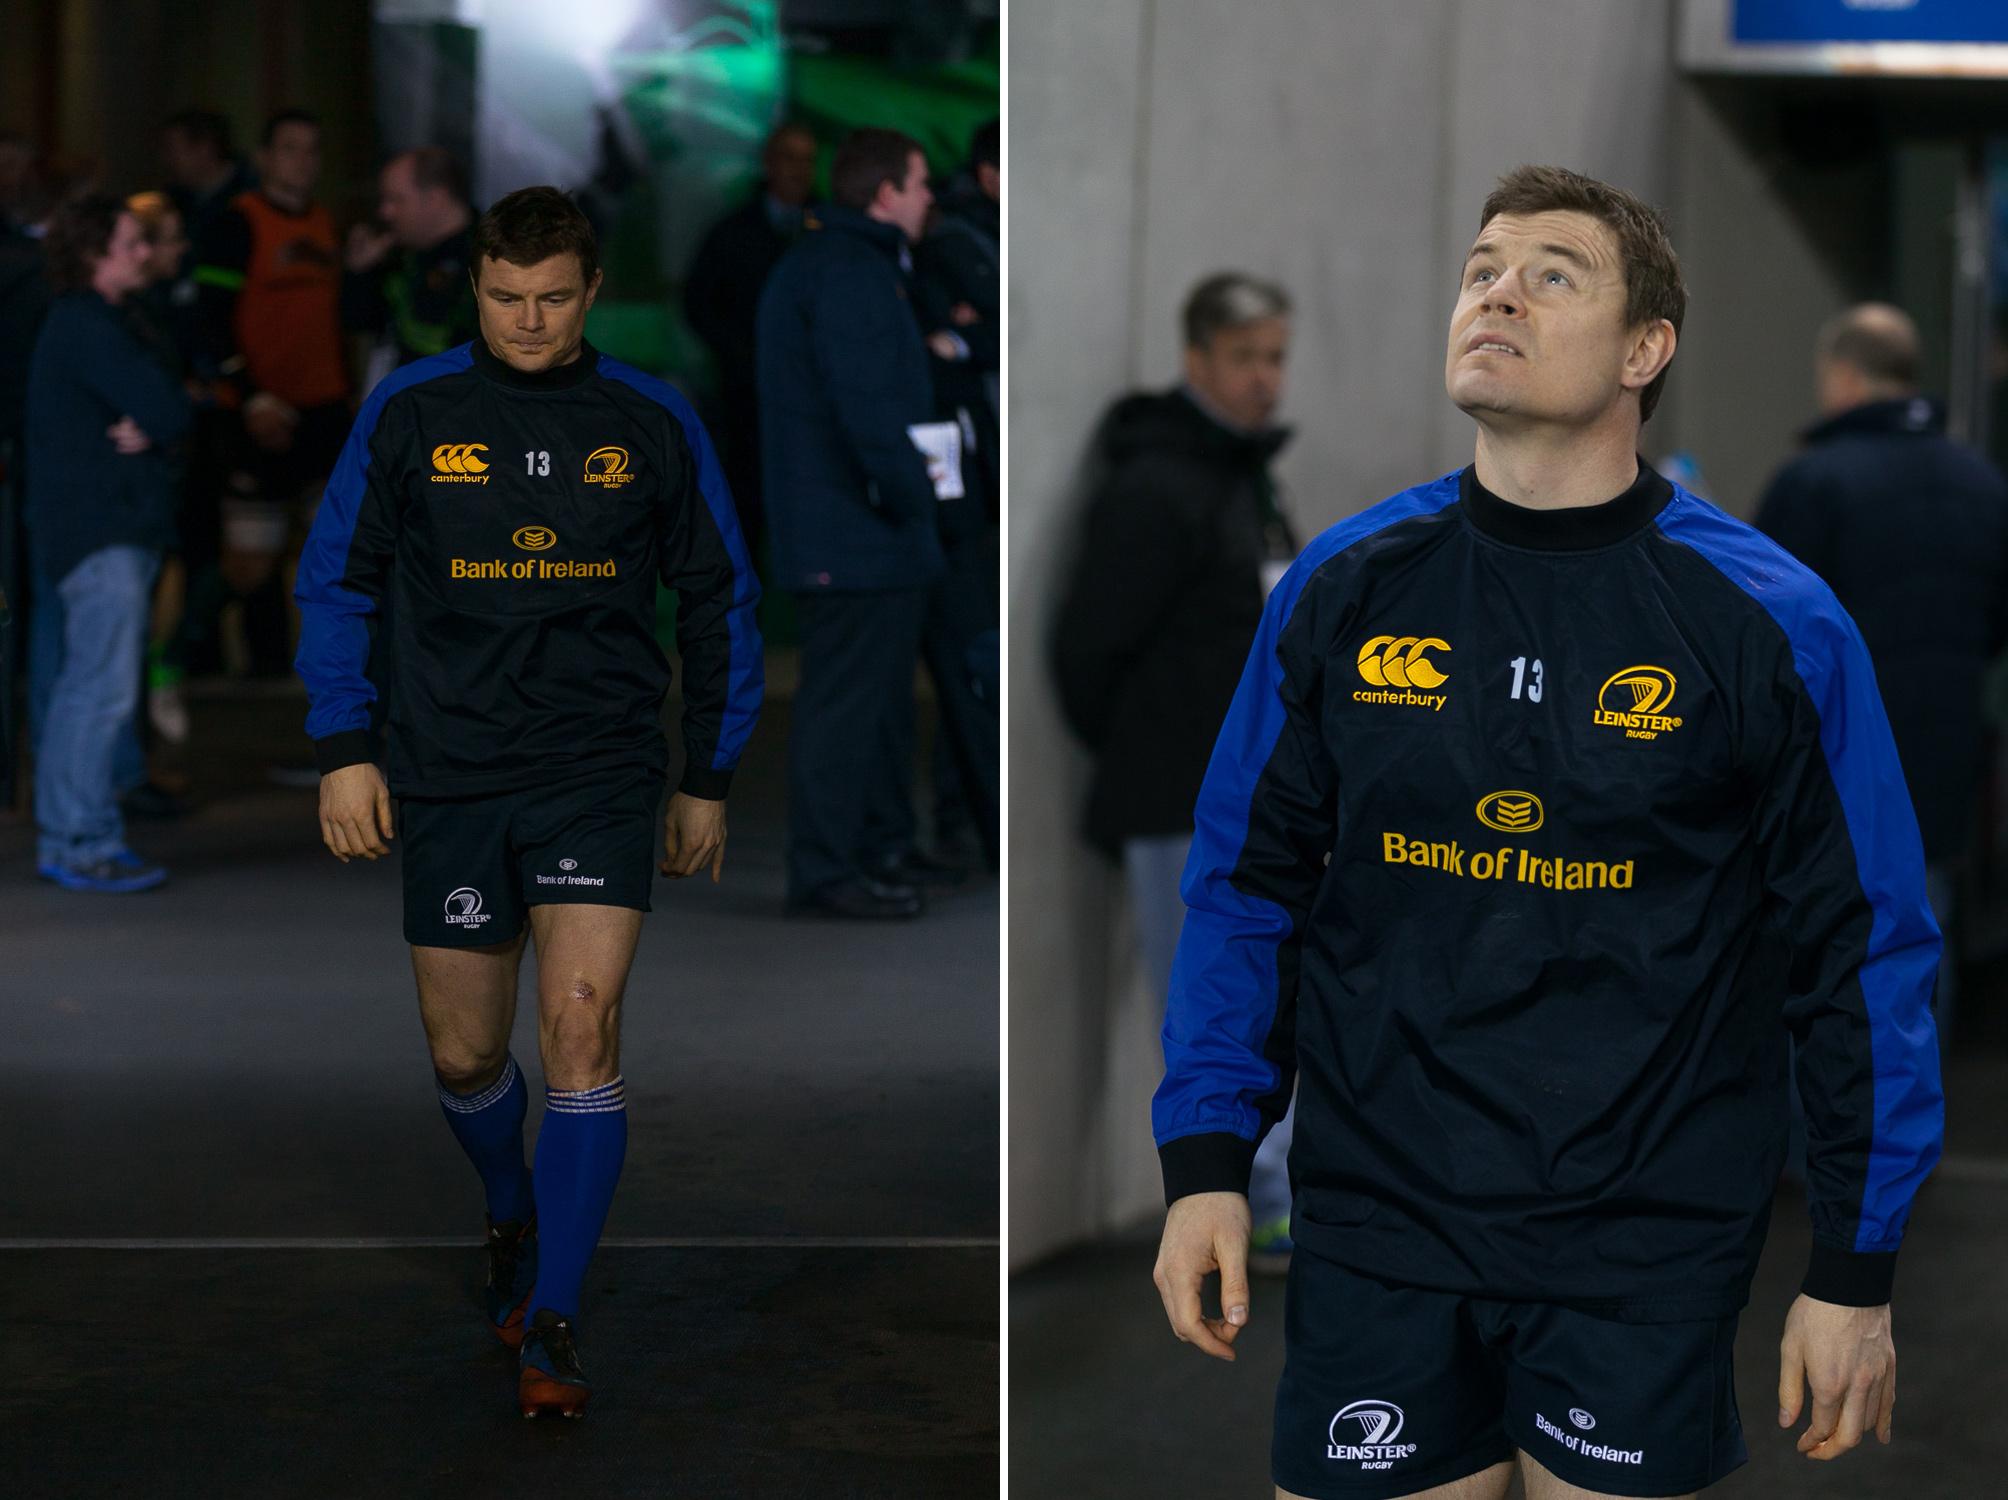 Leinster_vs_NorthamptonSaintsSkl3_Brian_ODriscol